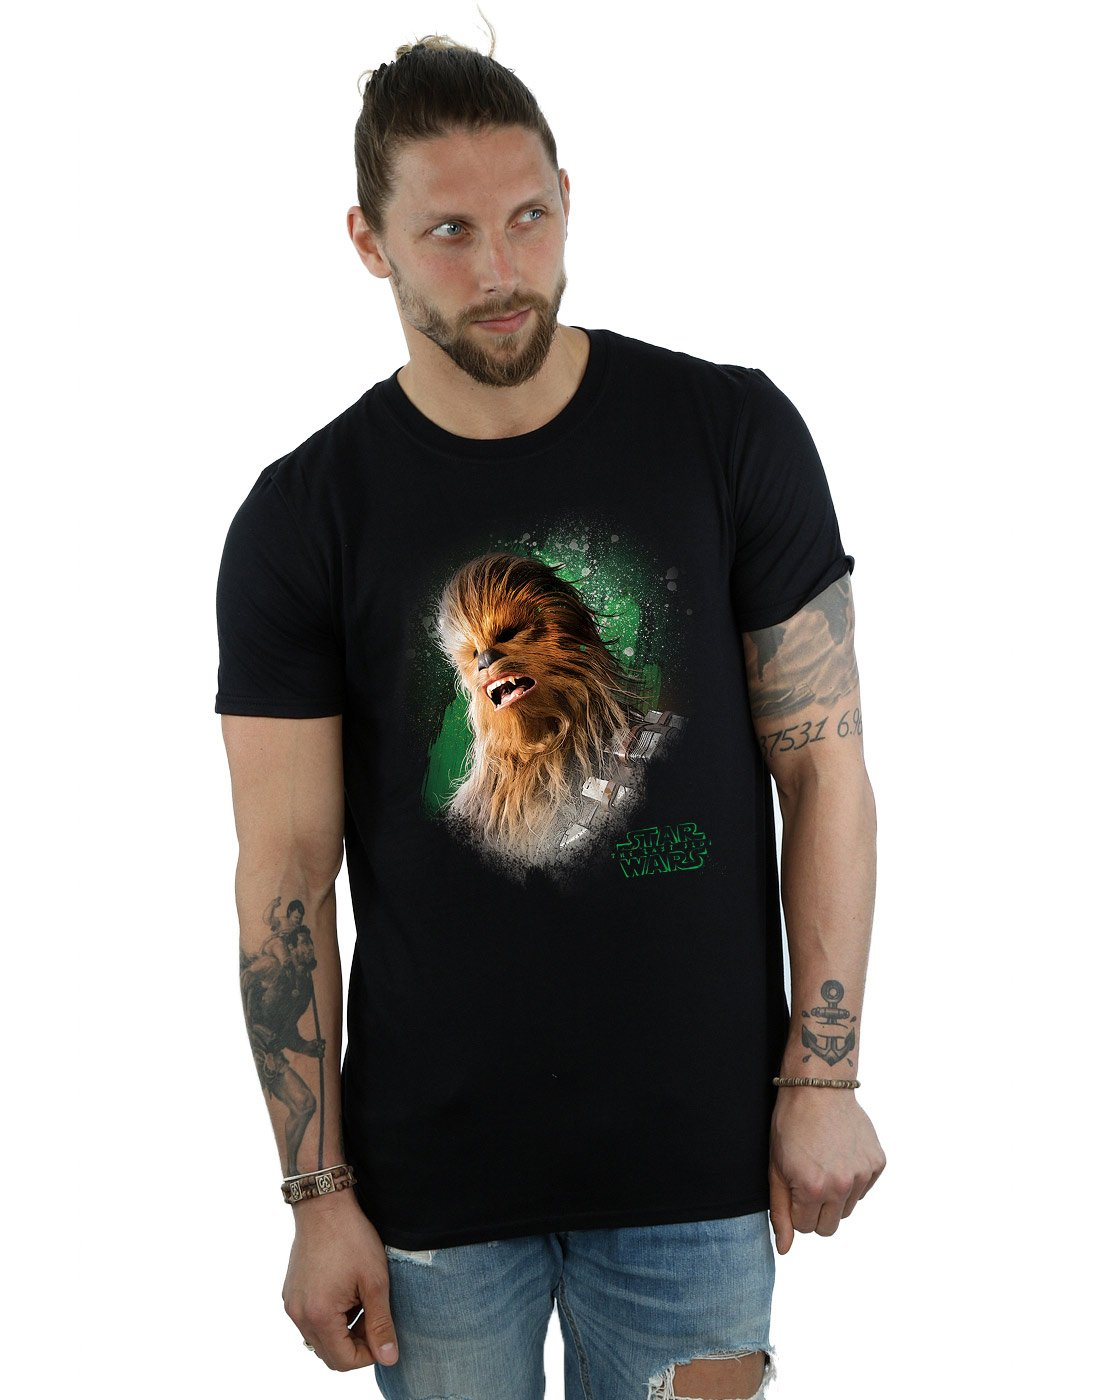 The Last Jedi Chewbacca Brushed T Shirt 4318